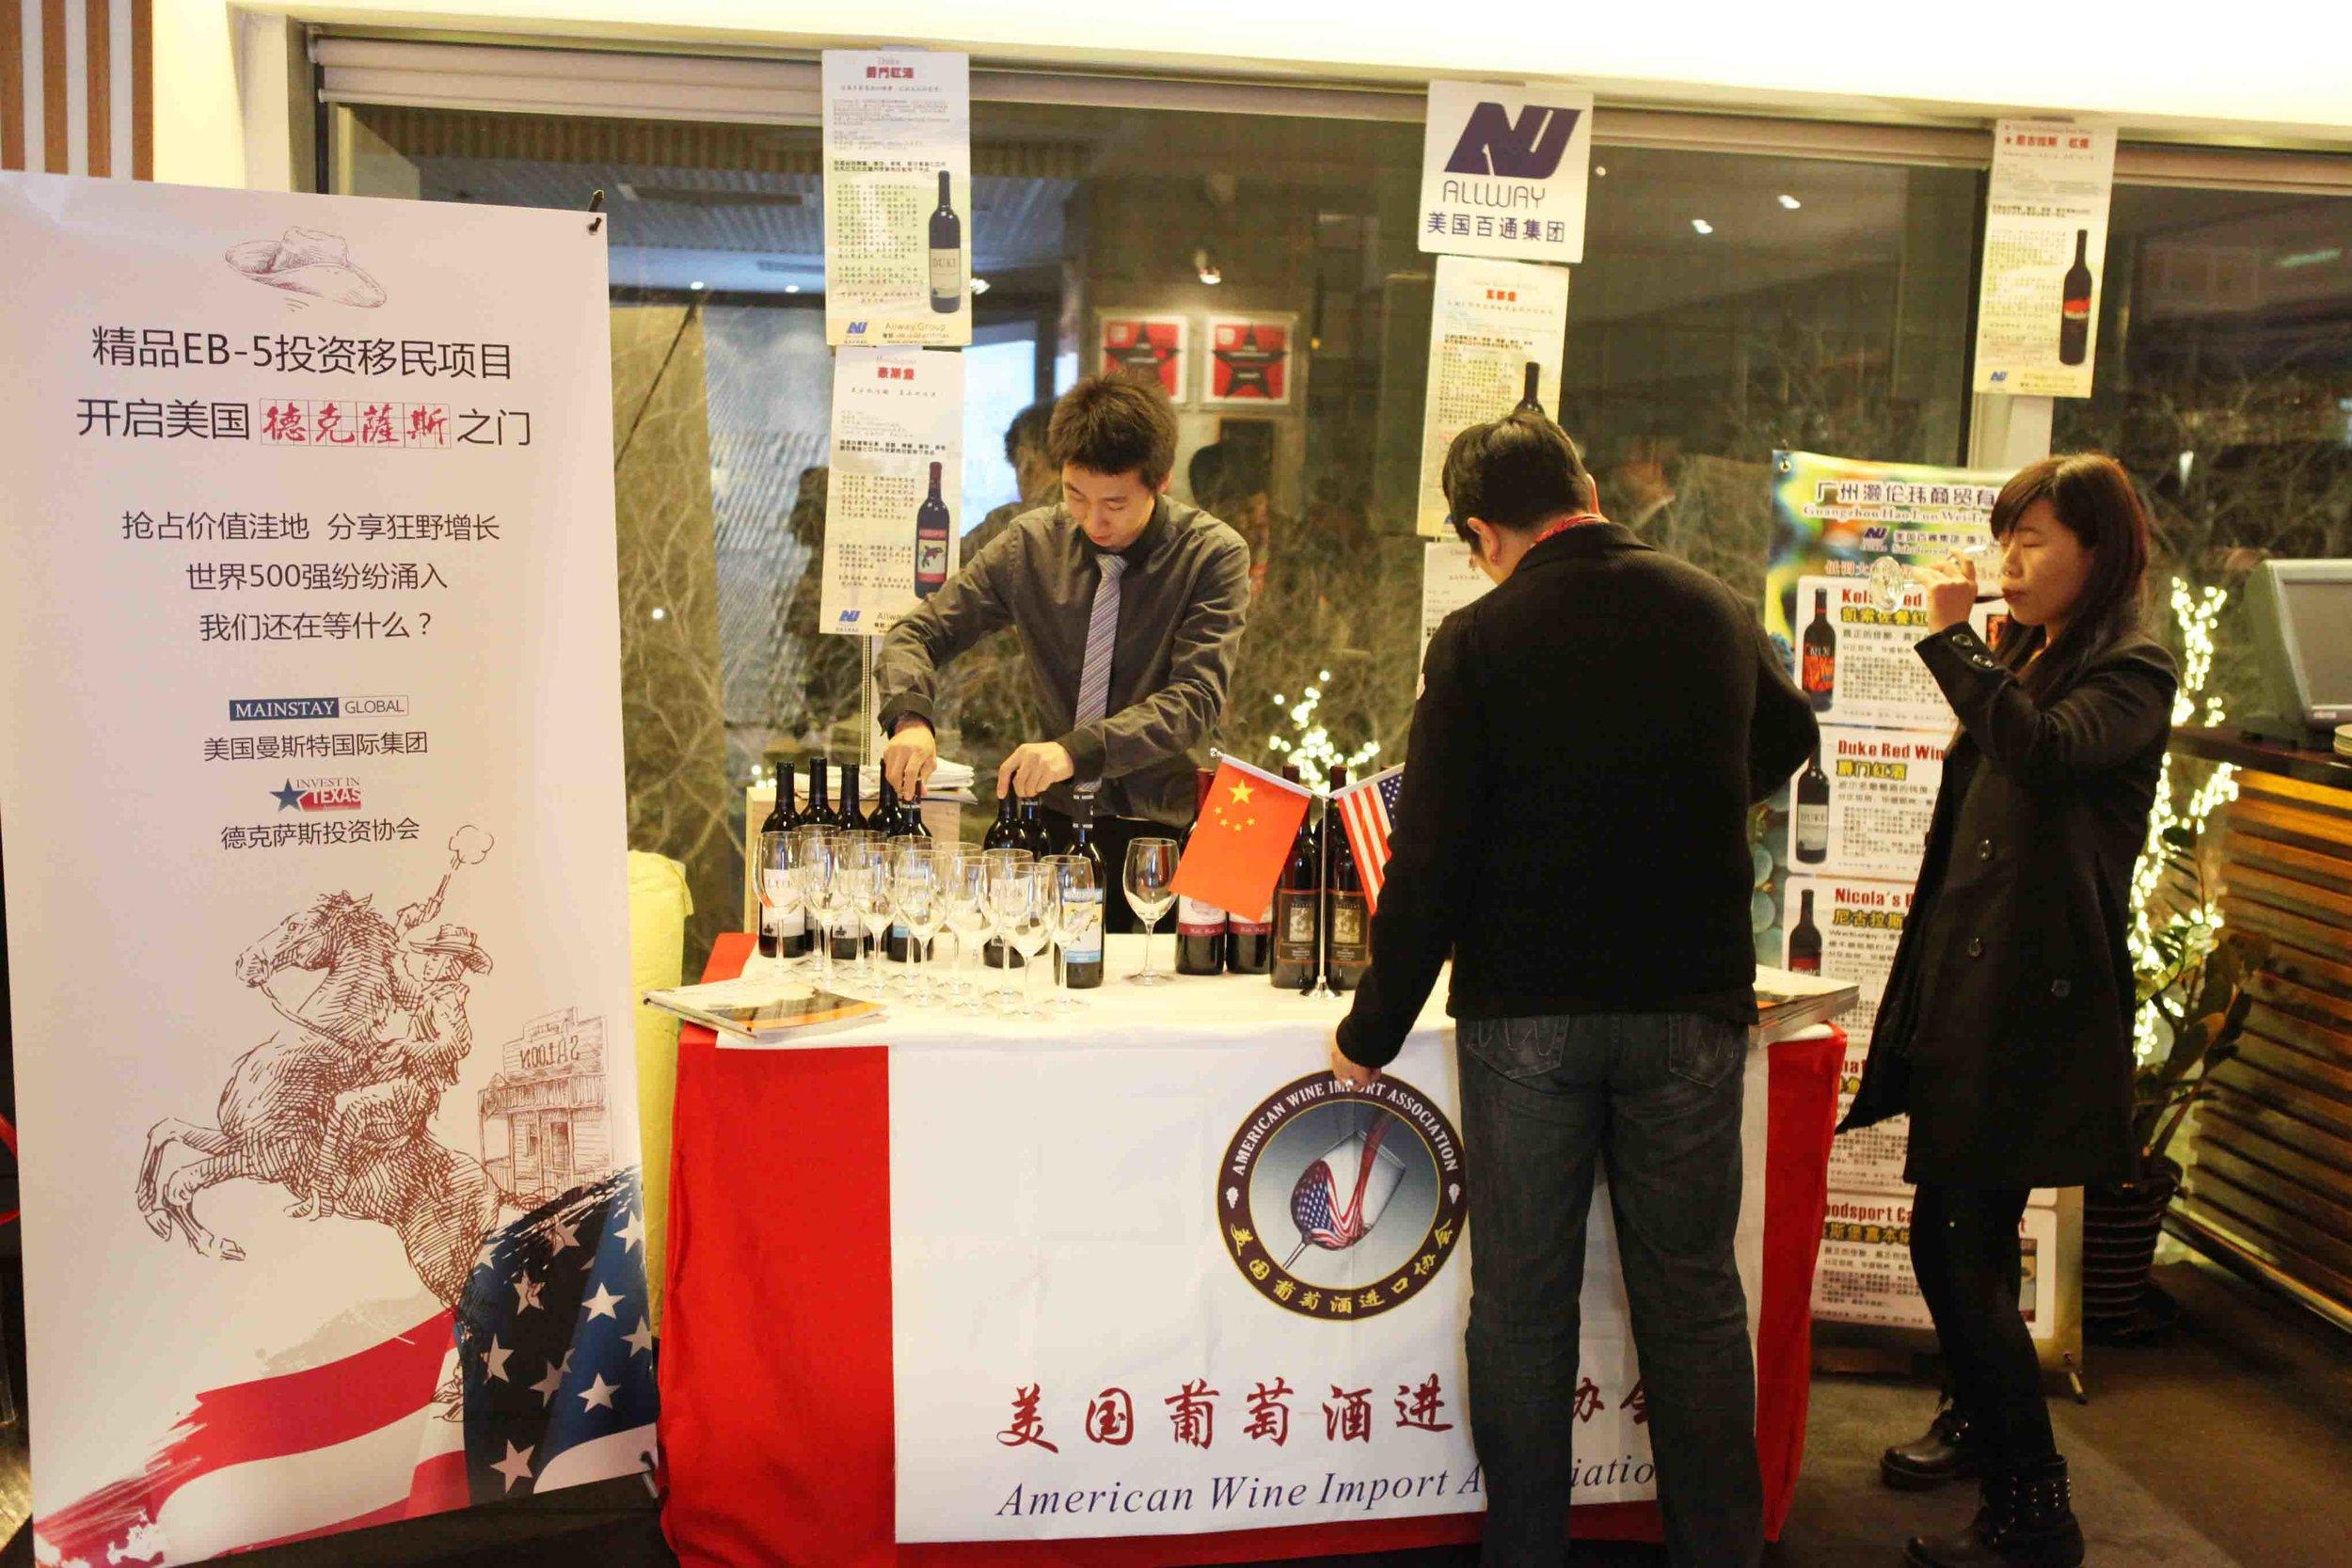 Nov 2013 Reception Event in Beijing (2)a.jpg